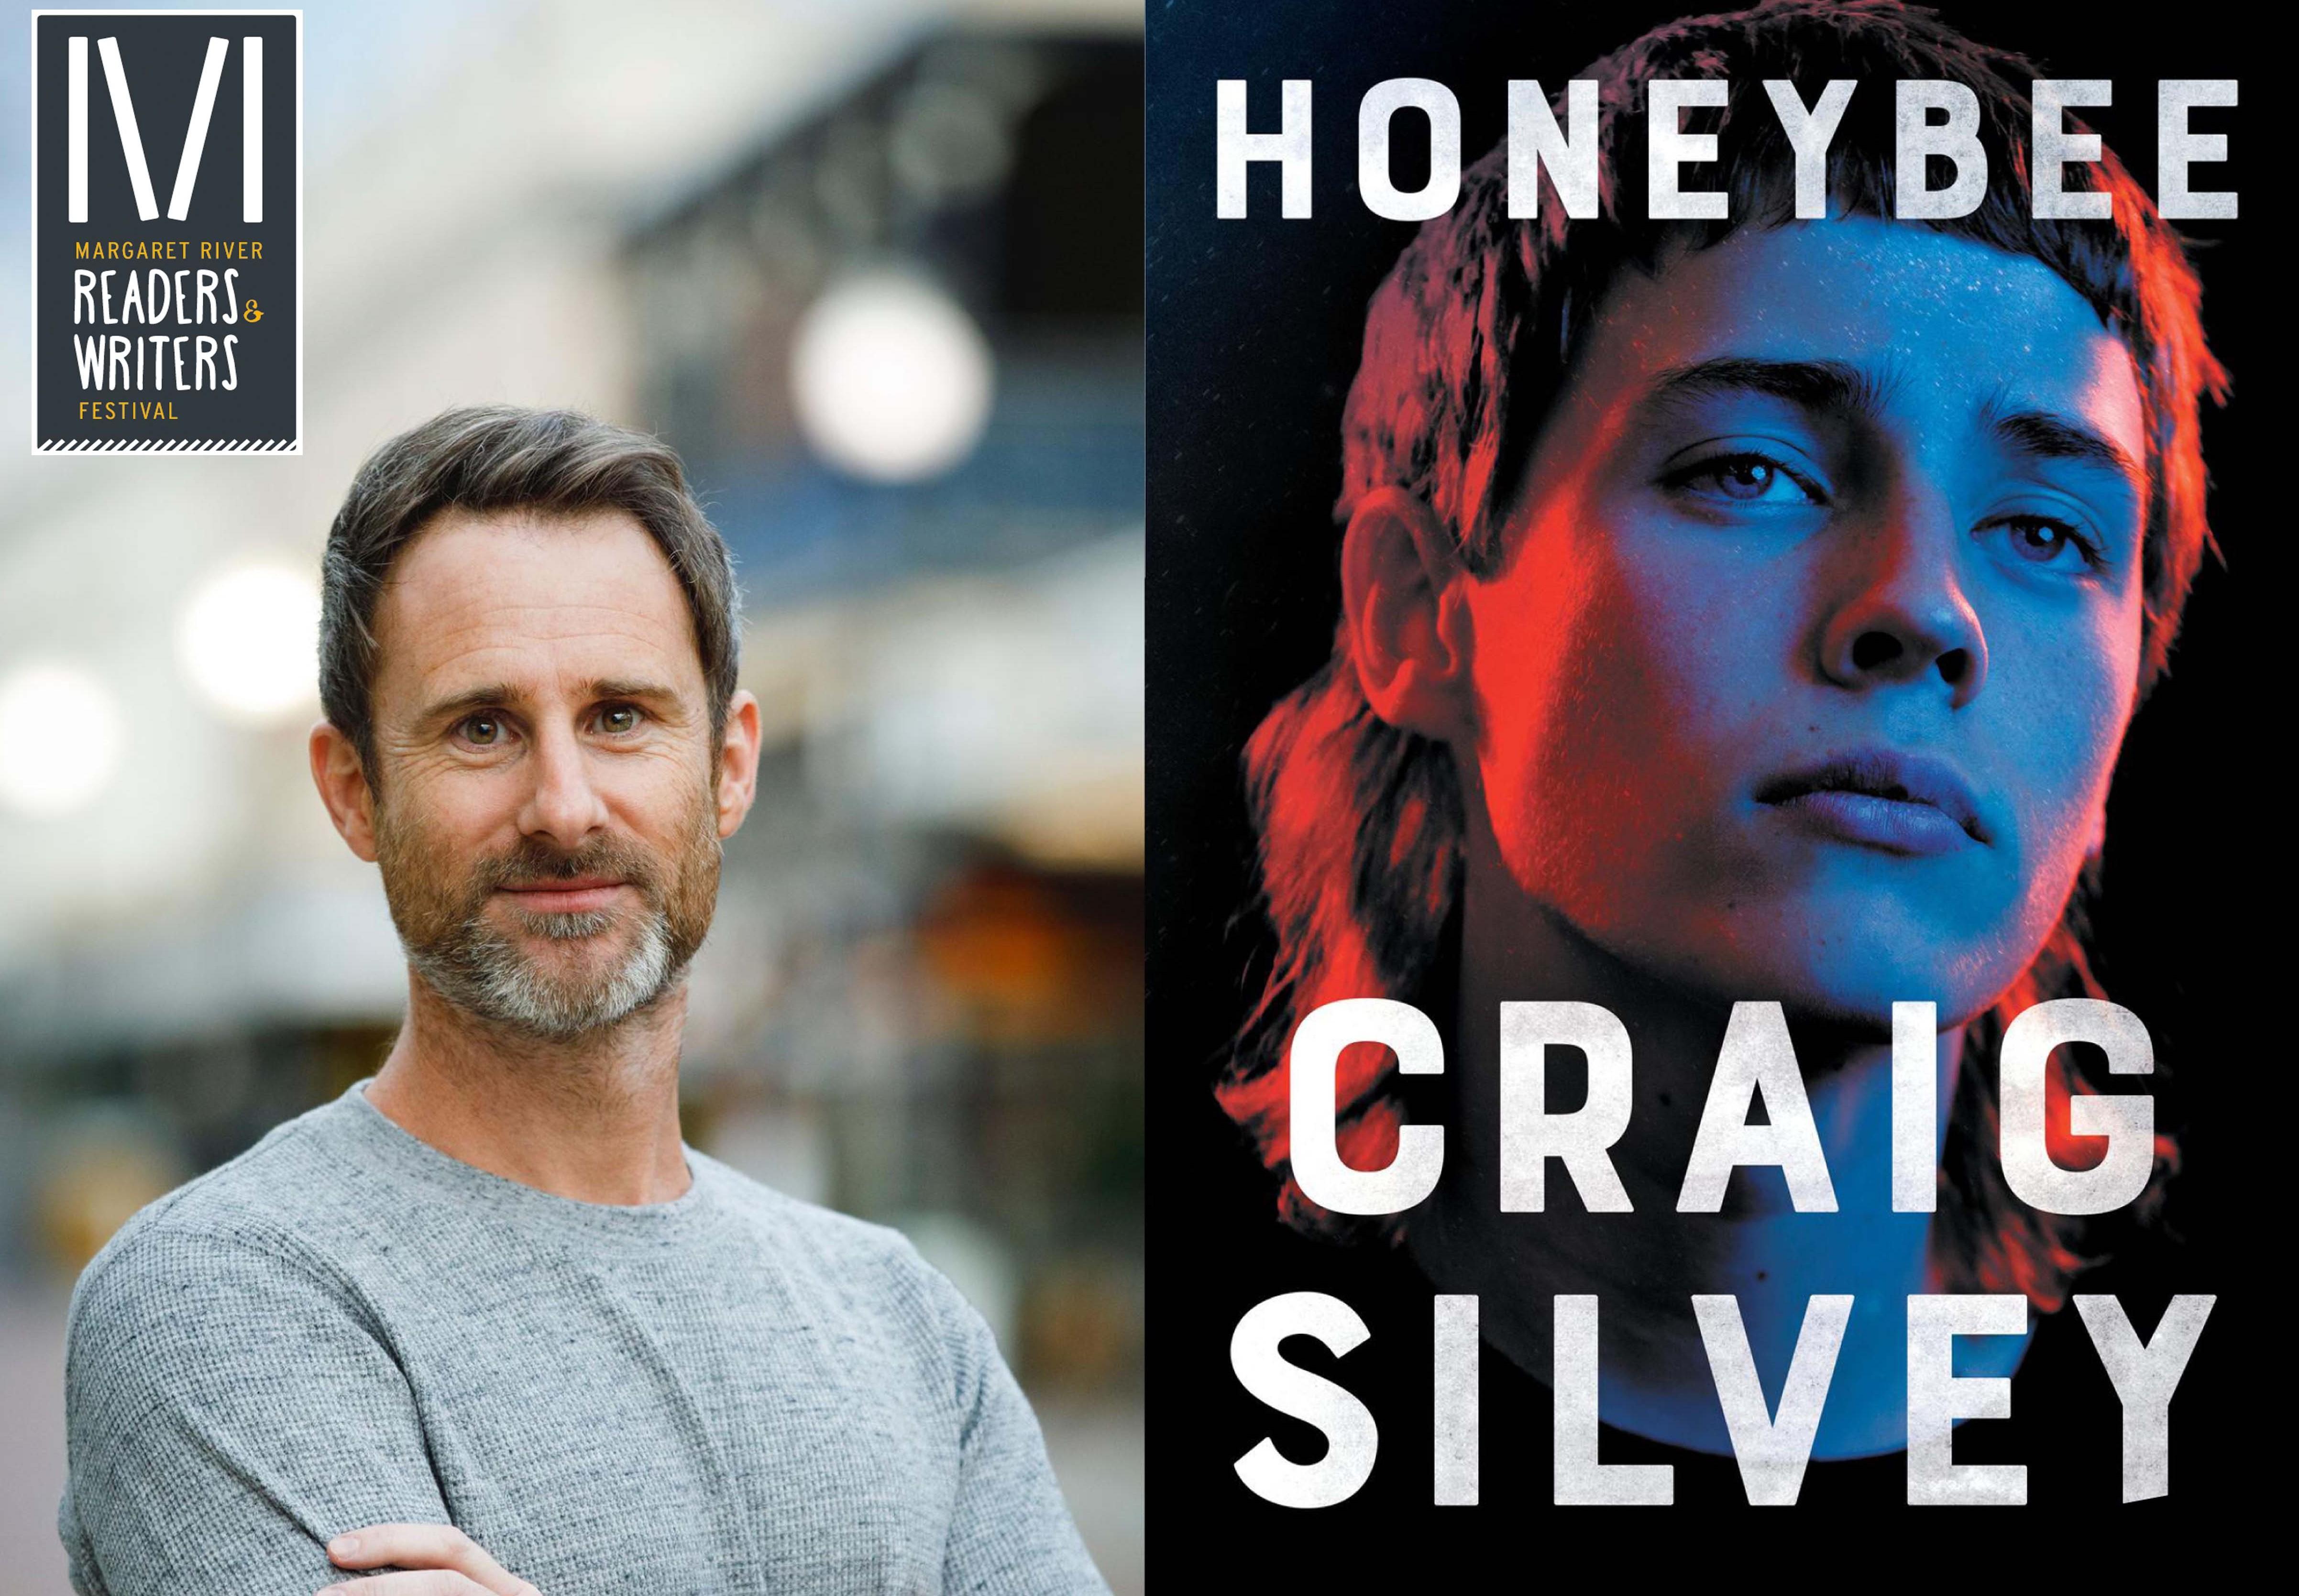 https://mrrwfestival.com/wp-content/uploads/2020/09/Honeybee_-Craig-Silvey-cropped.jpg